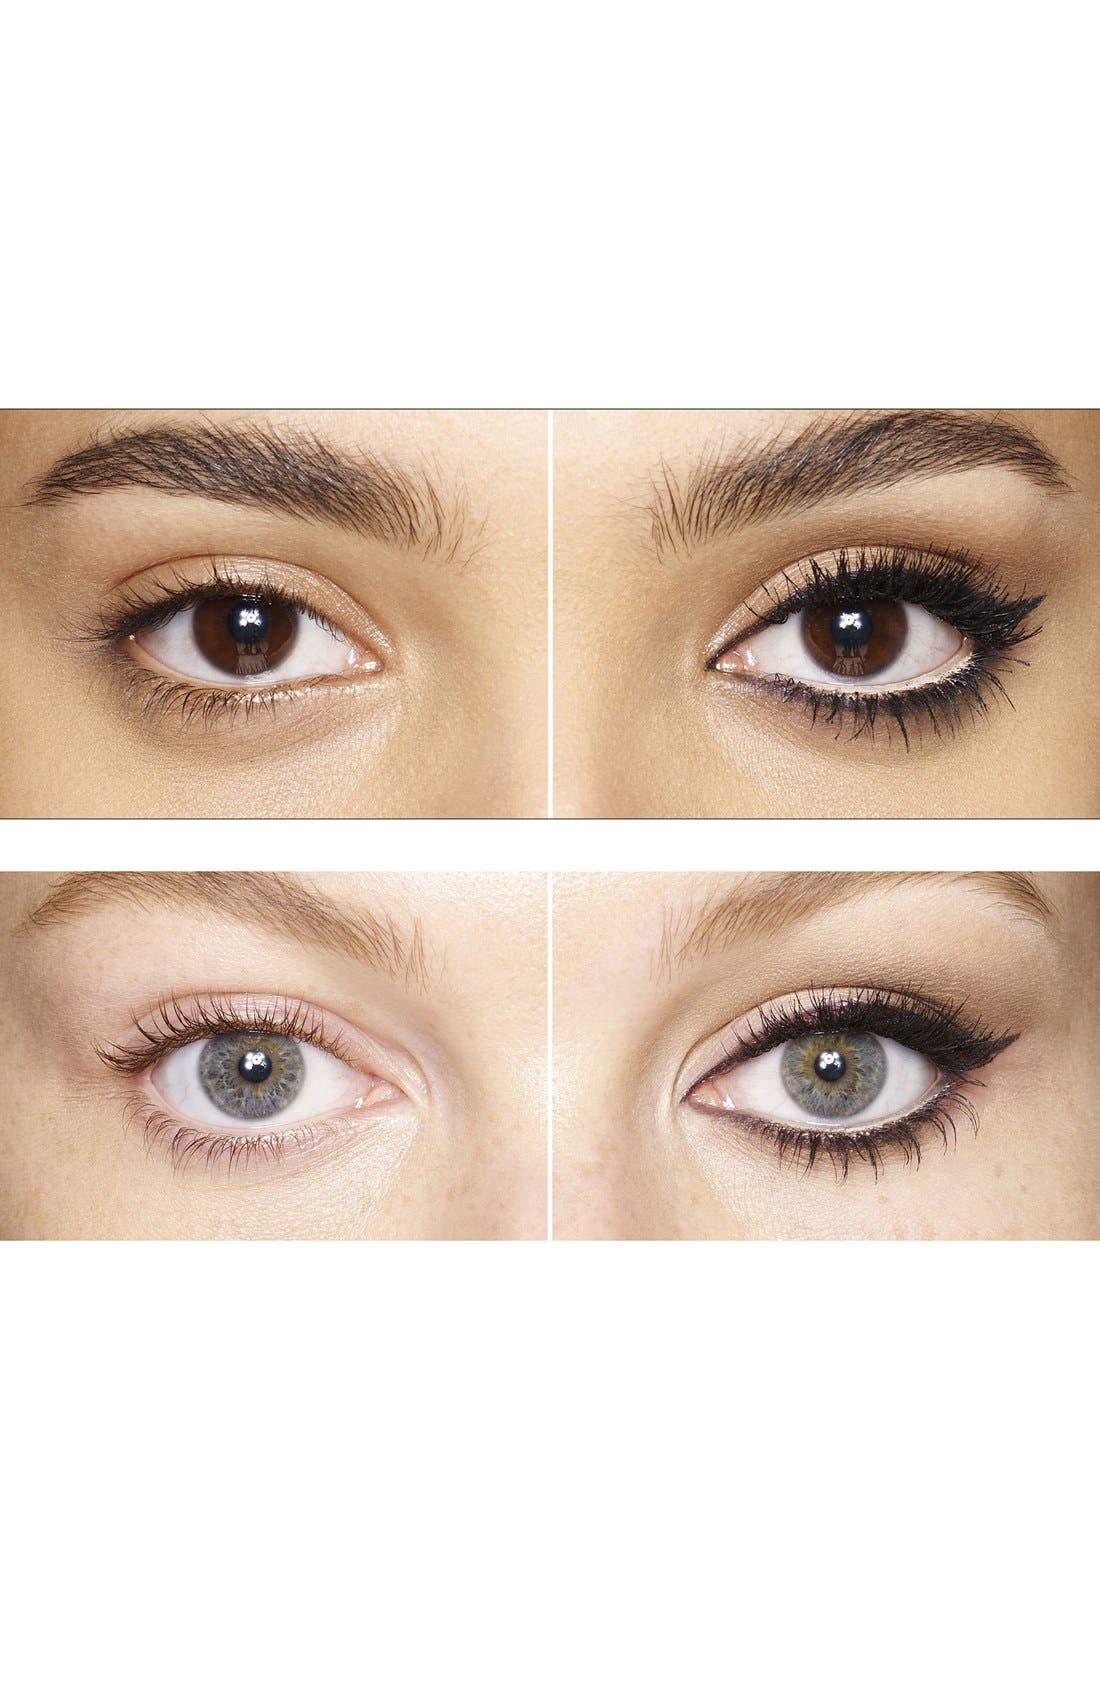 Charlotte Tilbury: Bigger Brighter Eyes